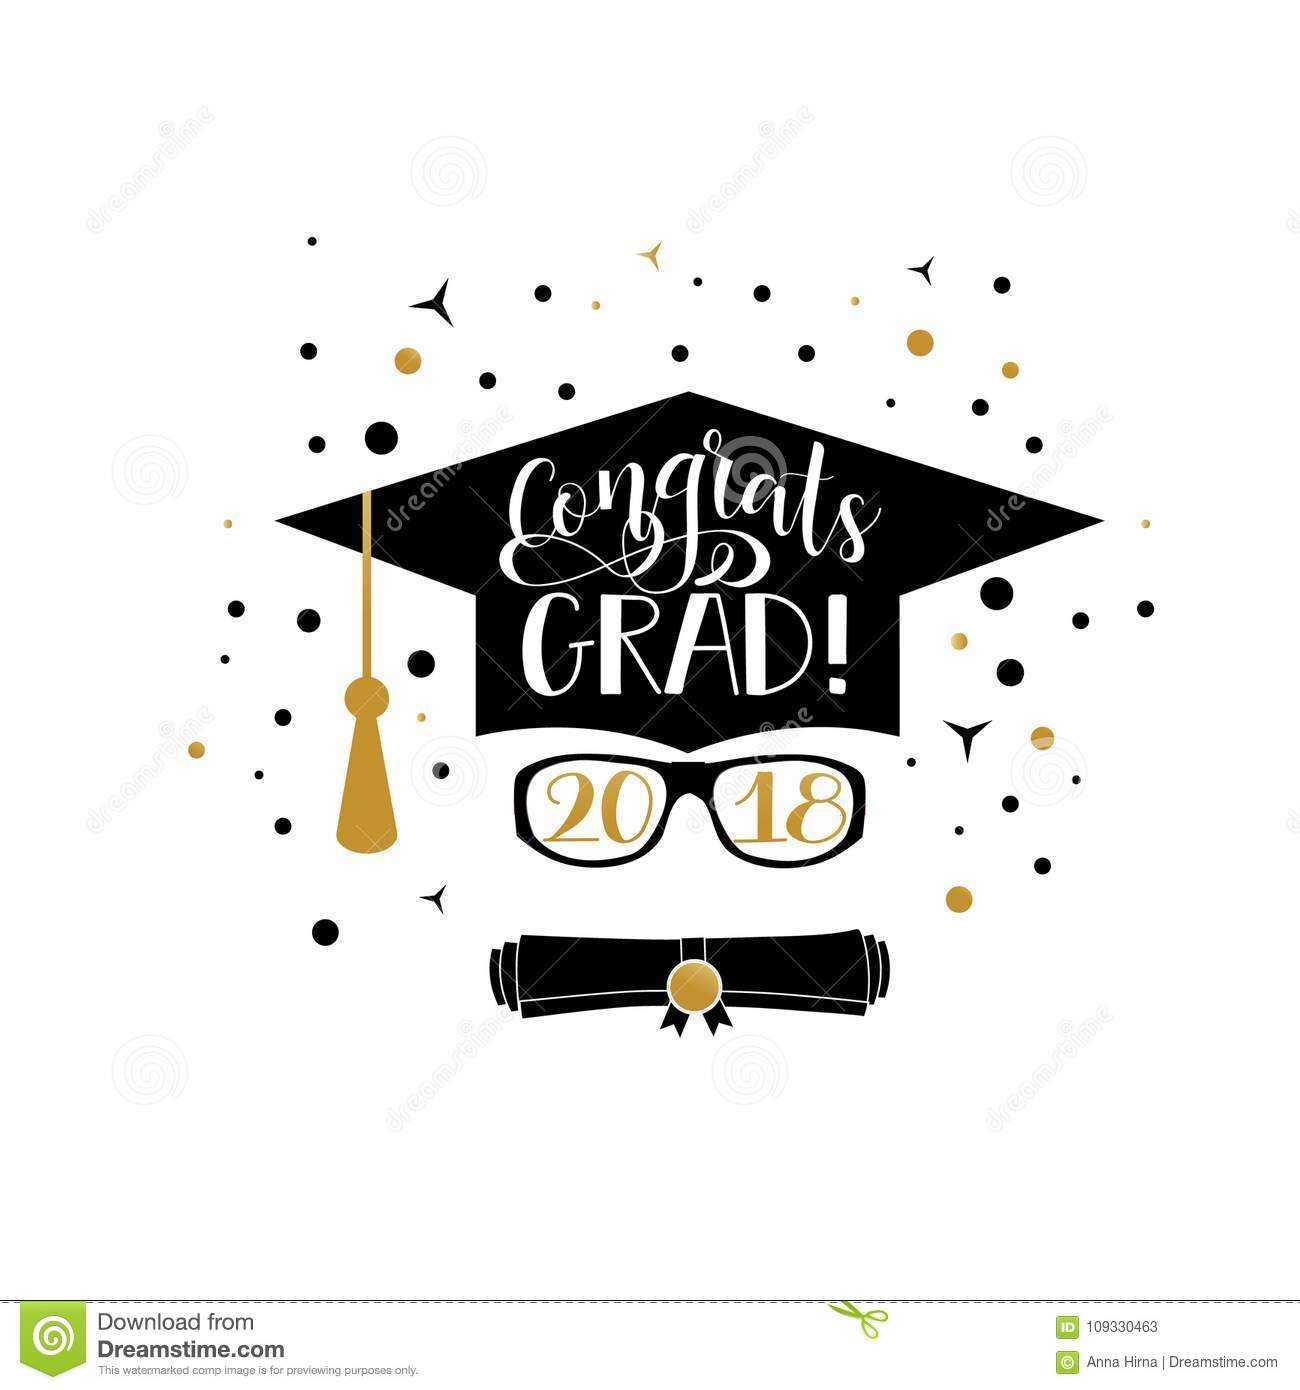 Congrats Grad 2018 Lettering. Congratulations Graduate In Graduation Banner Template